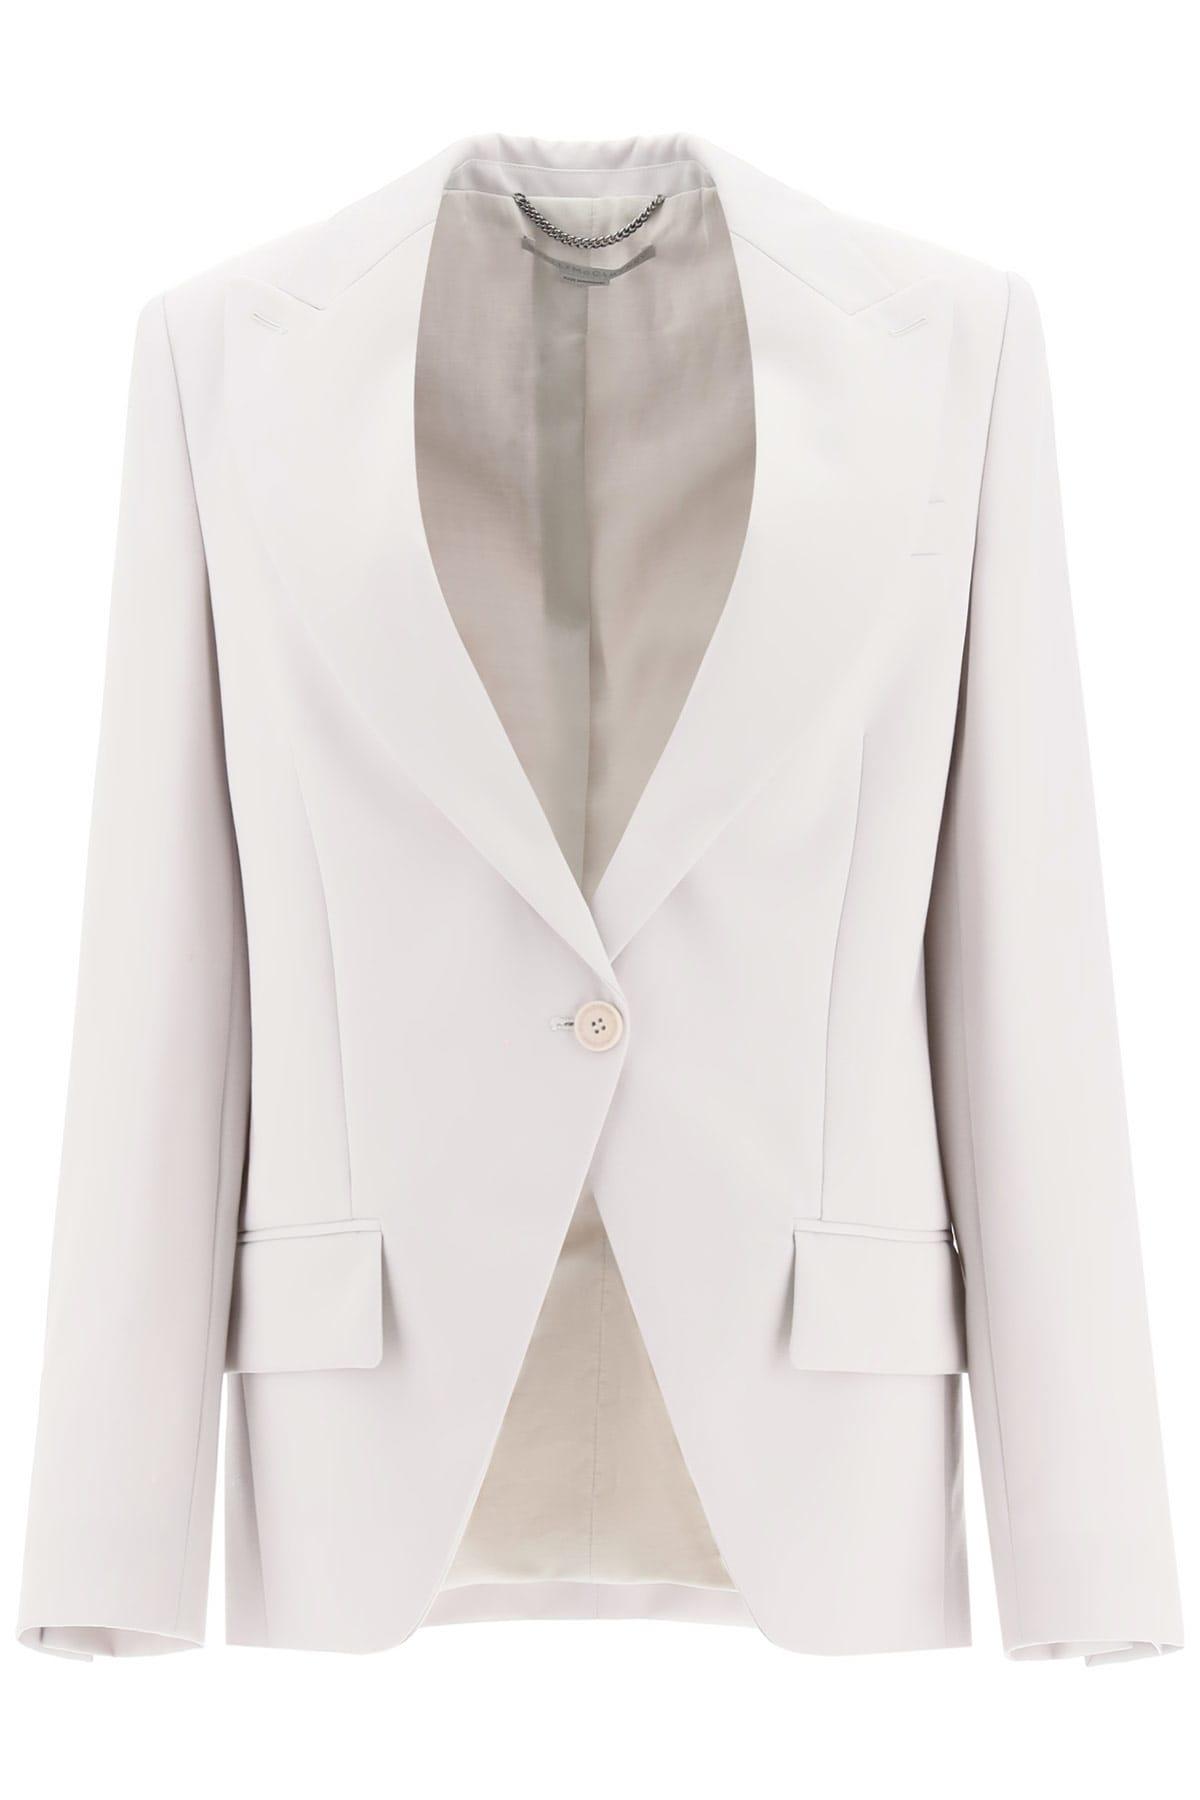 Stella McCartney Lindsay Single-breasted Blazer